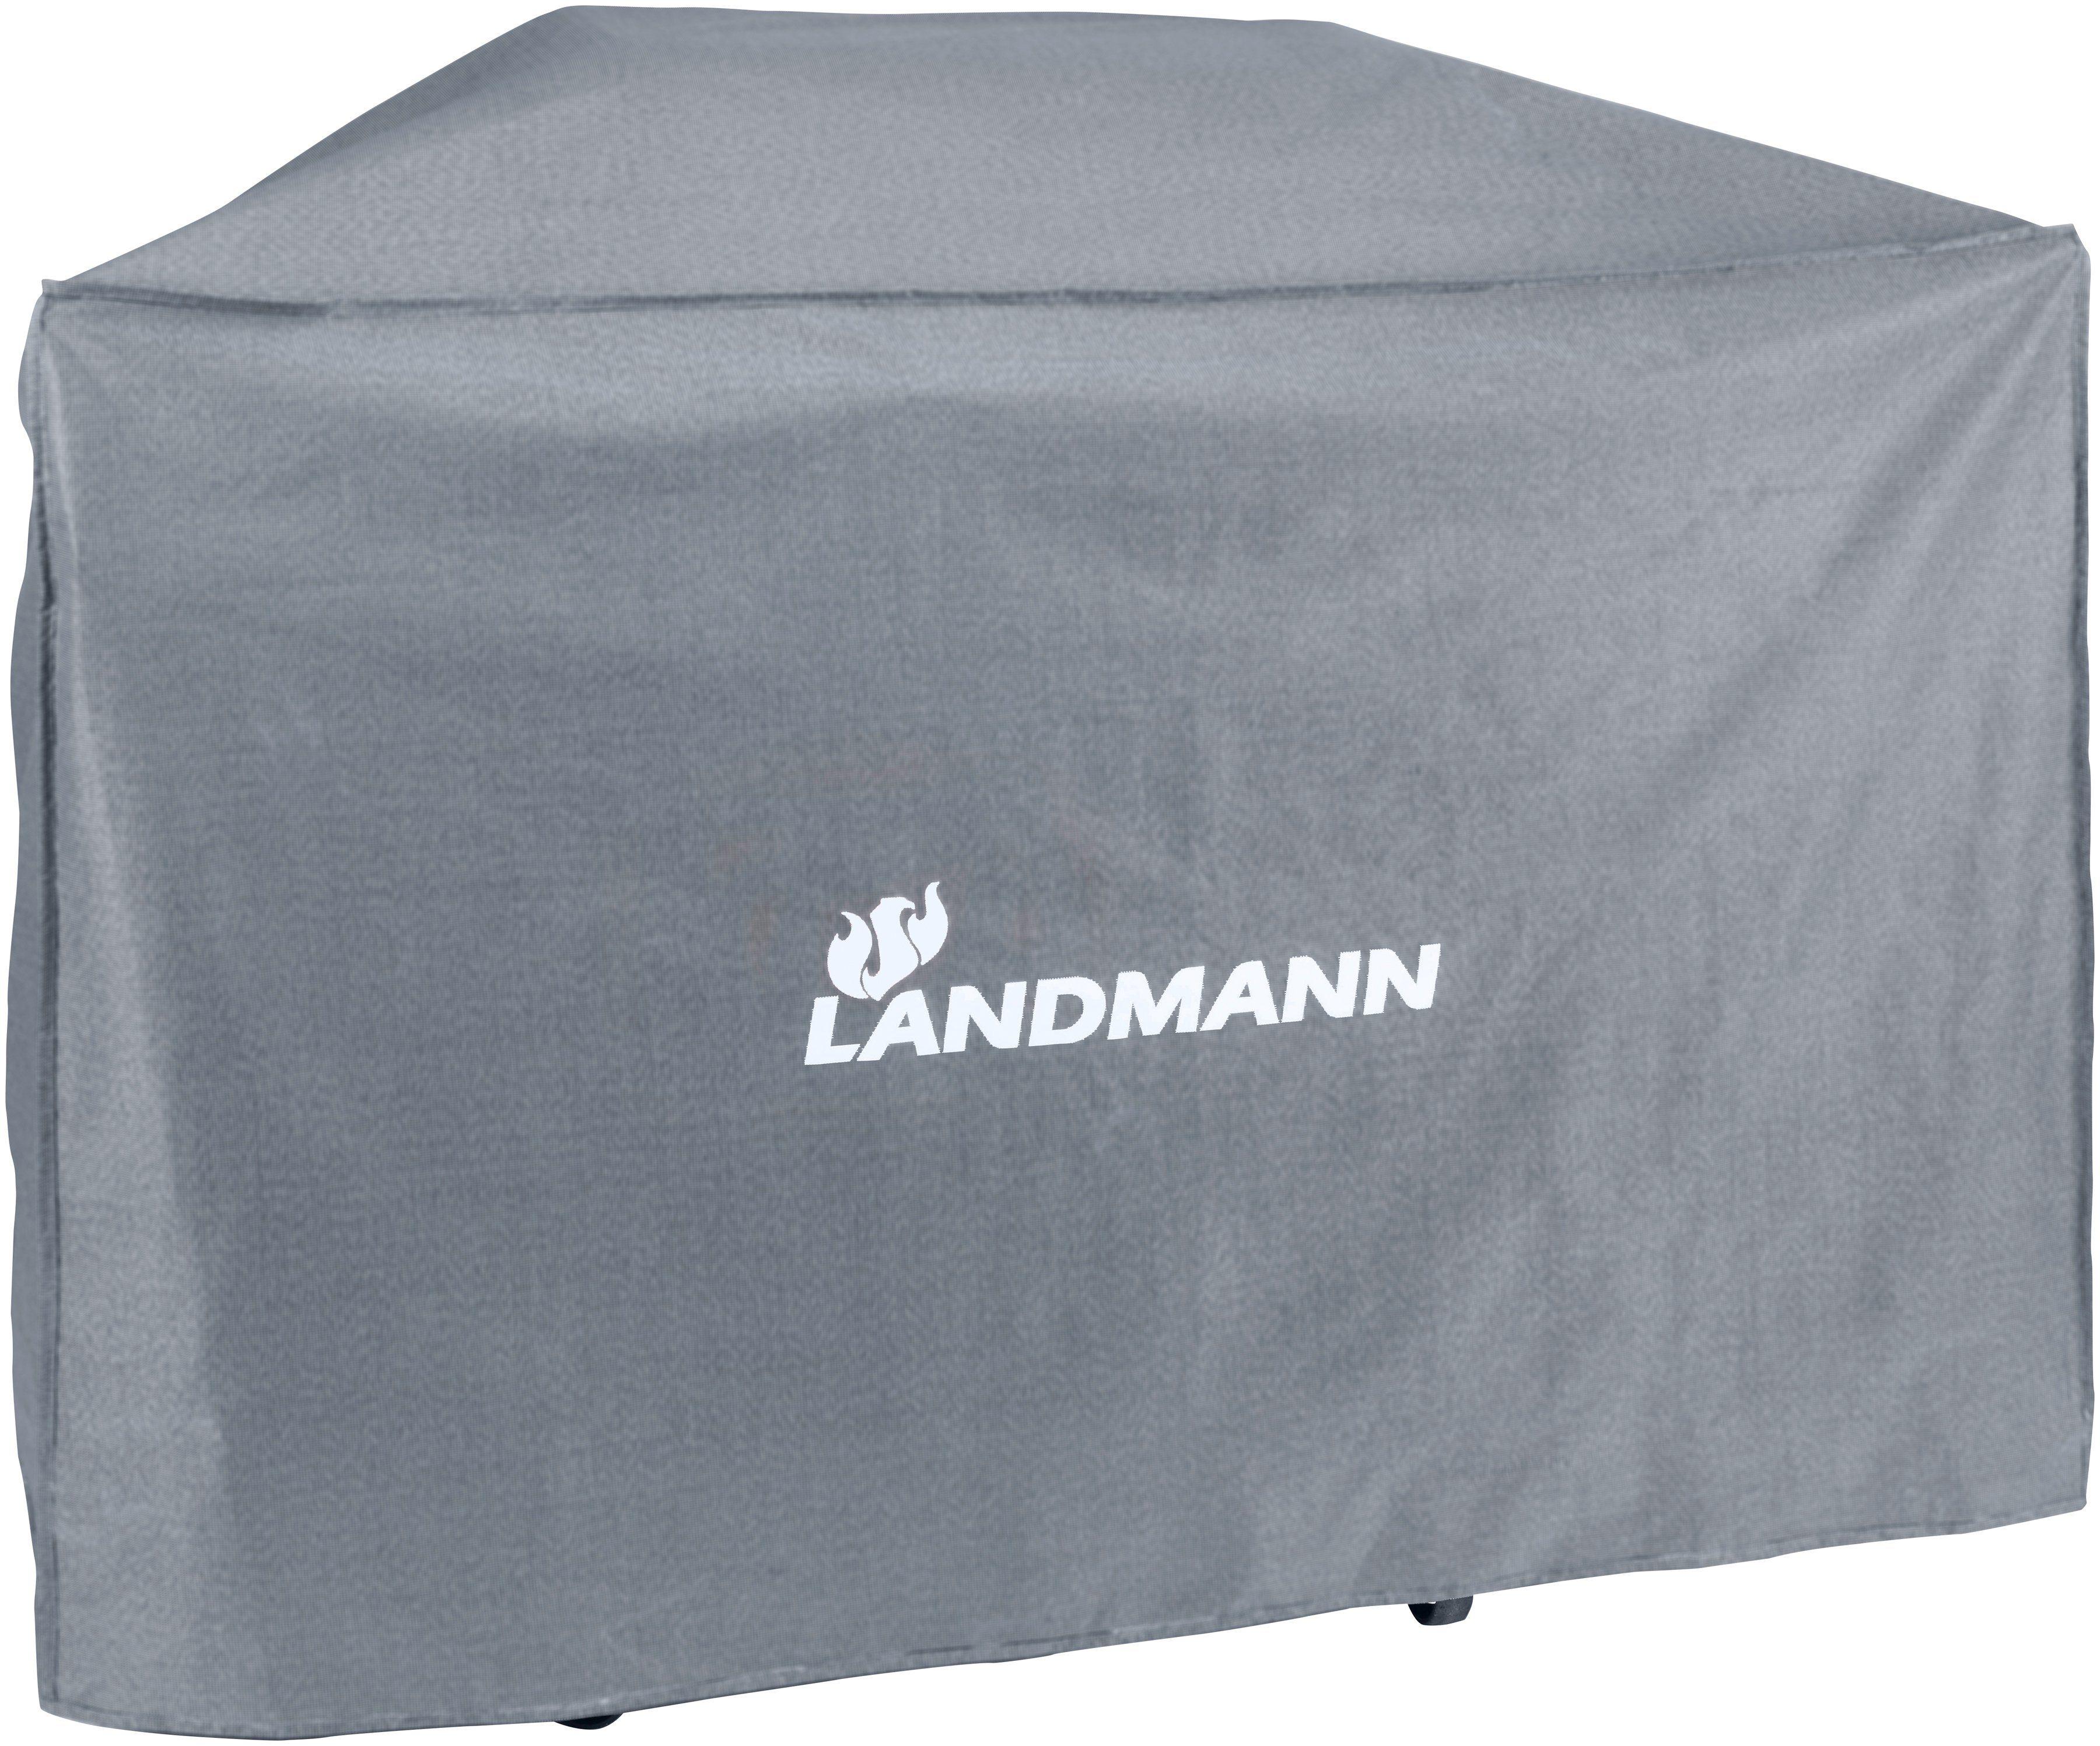 Landmann Gasgrill Otto : Landmann schutzhülle premium xl« bxtxh cm online